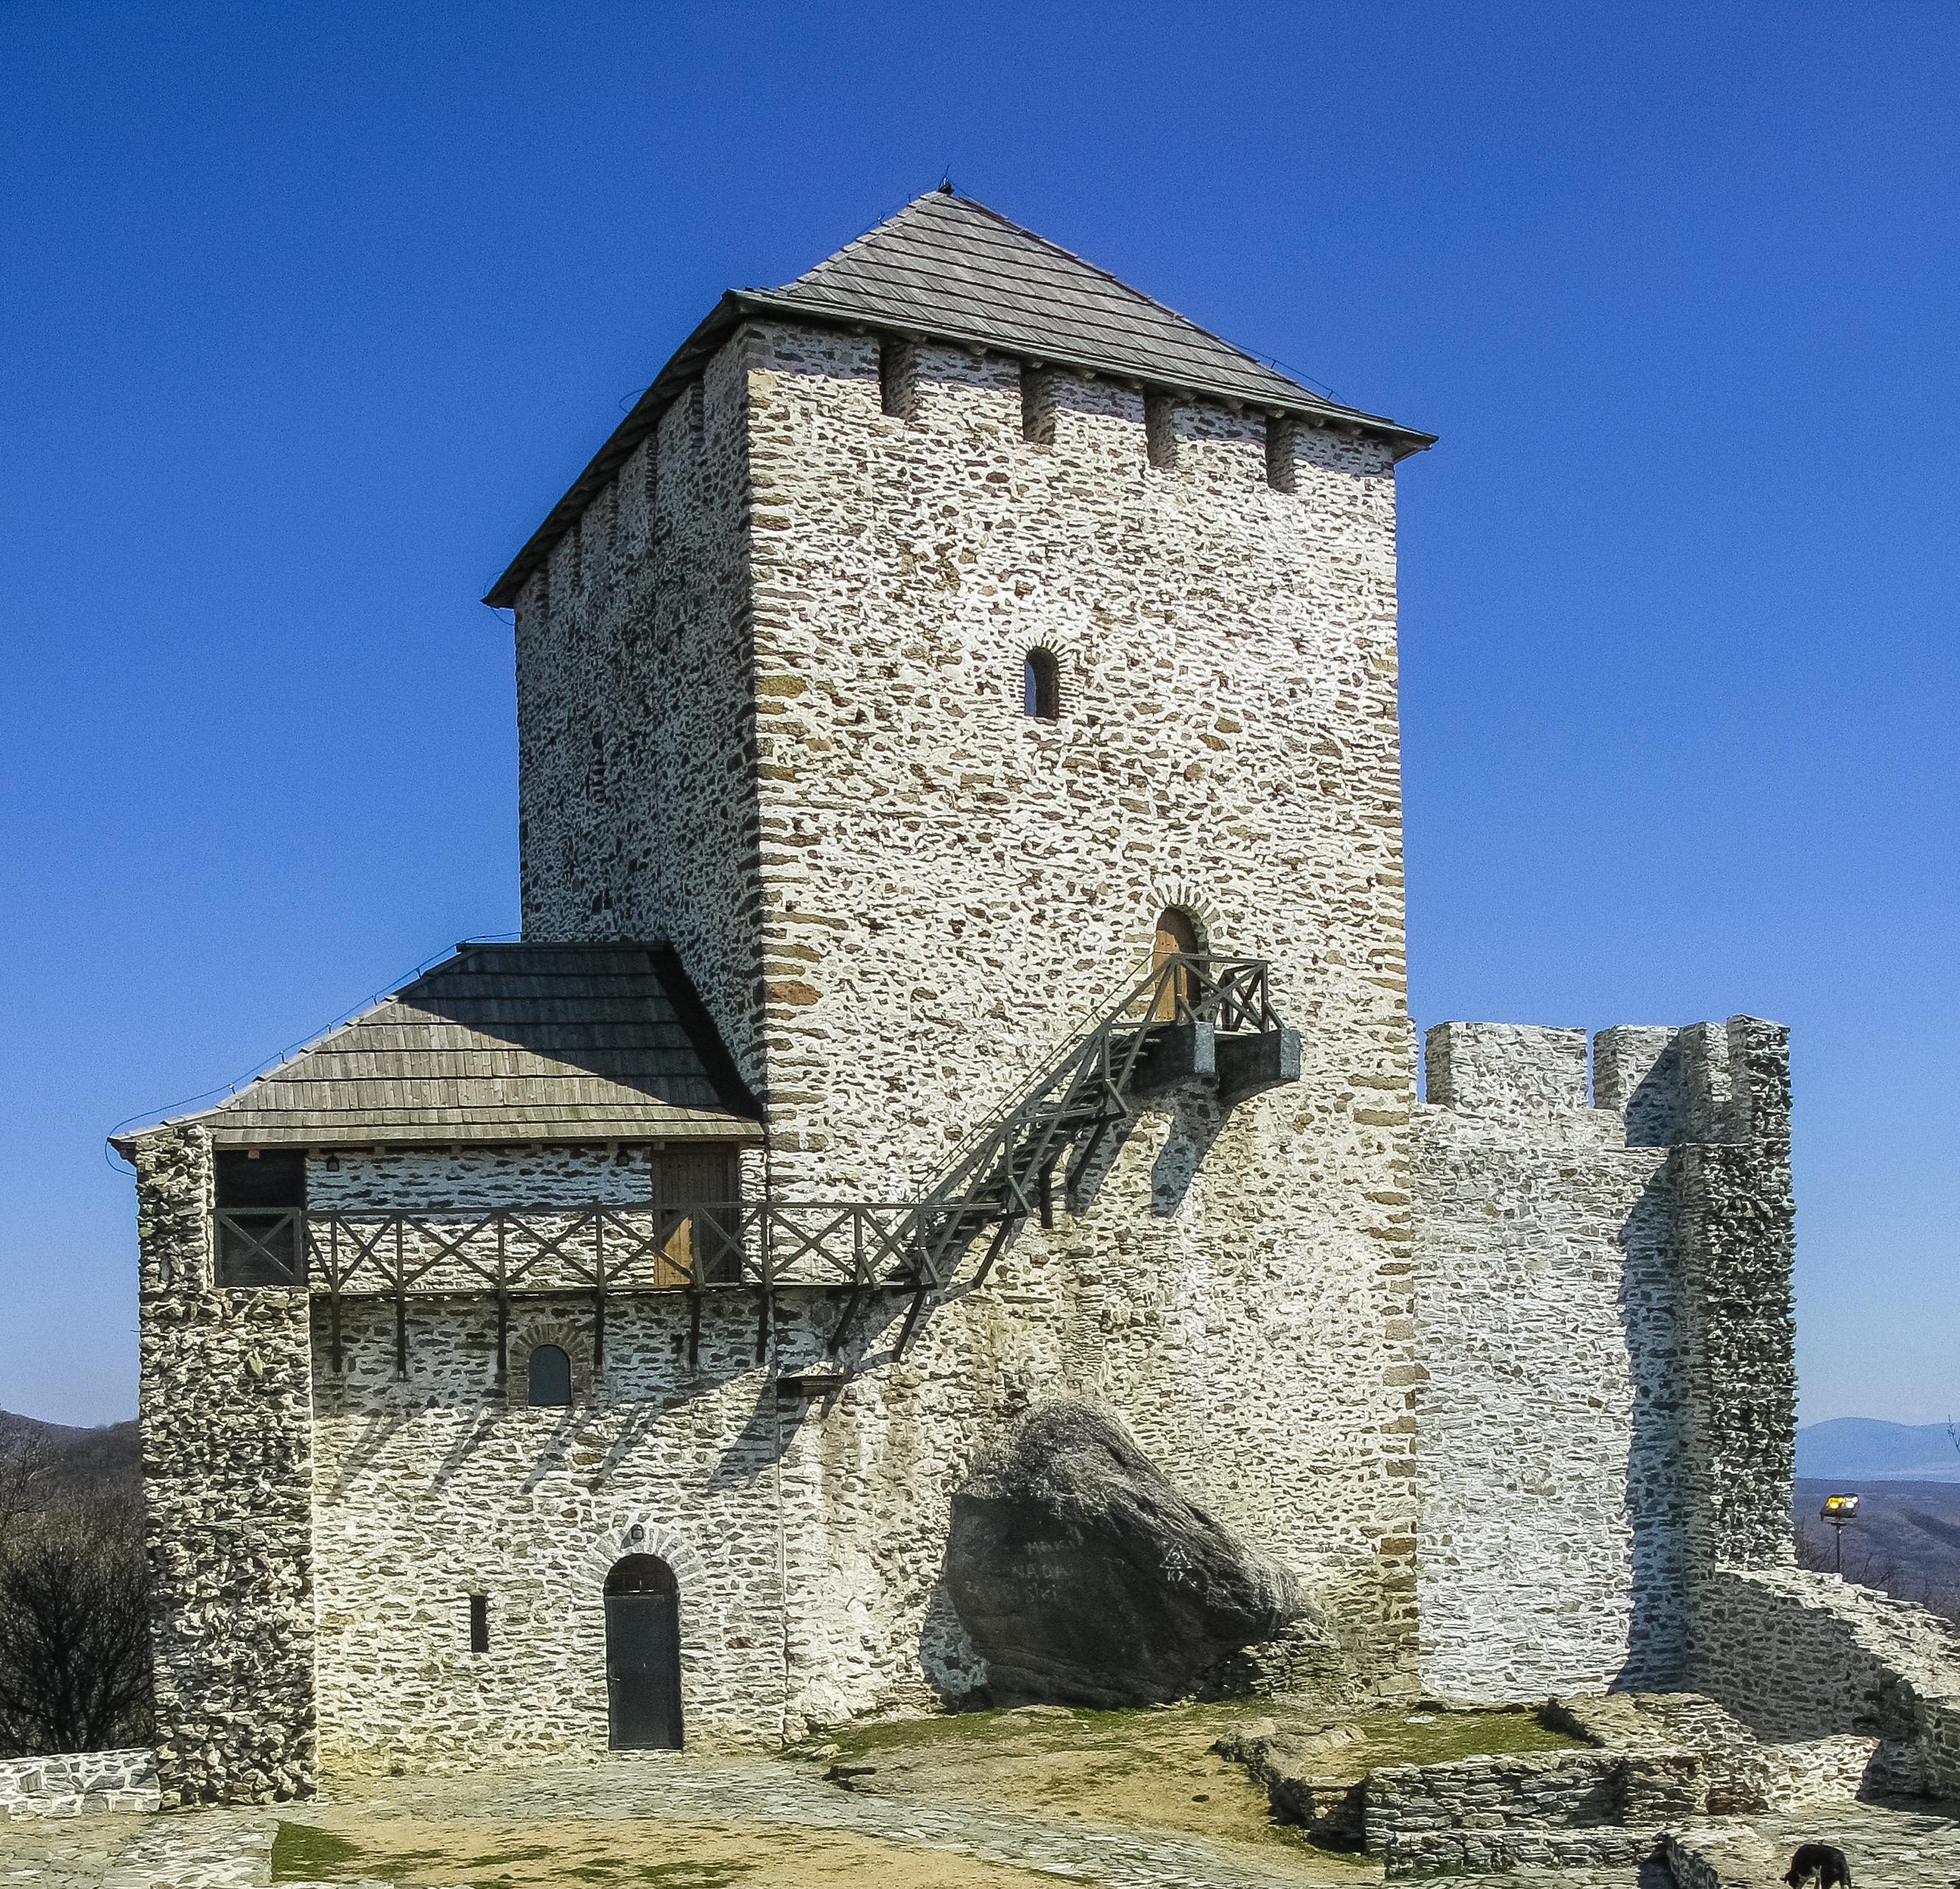 File:Vršačka kula posle obnove2.jpg - Wikimedia Commons